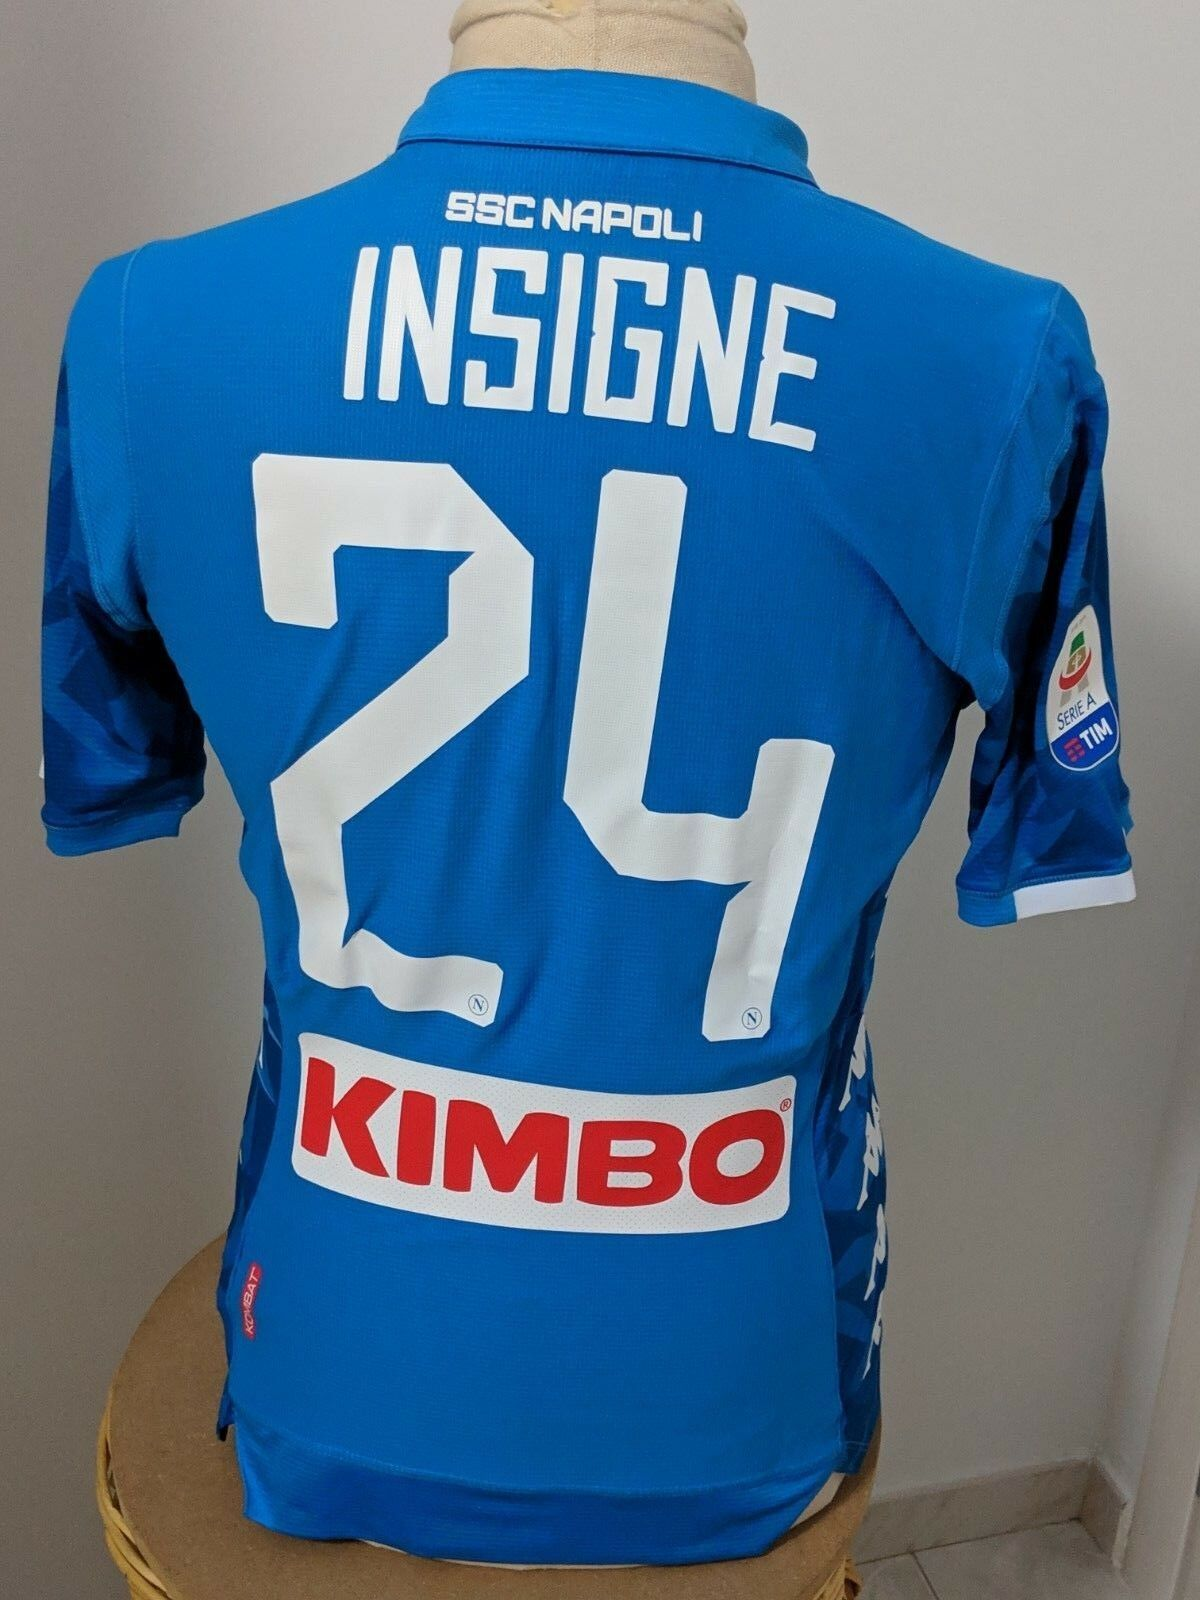 Maglia Napoli 2017 18 24 Insigne match worn shirt Jersey Naples camiseta vintage